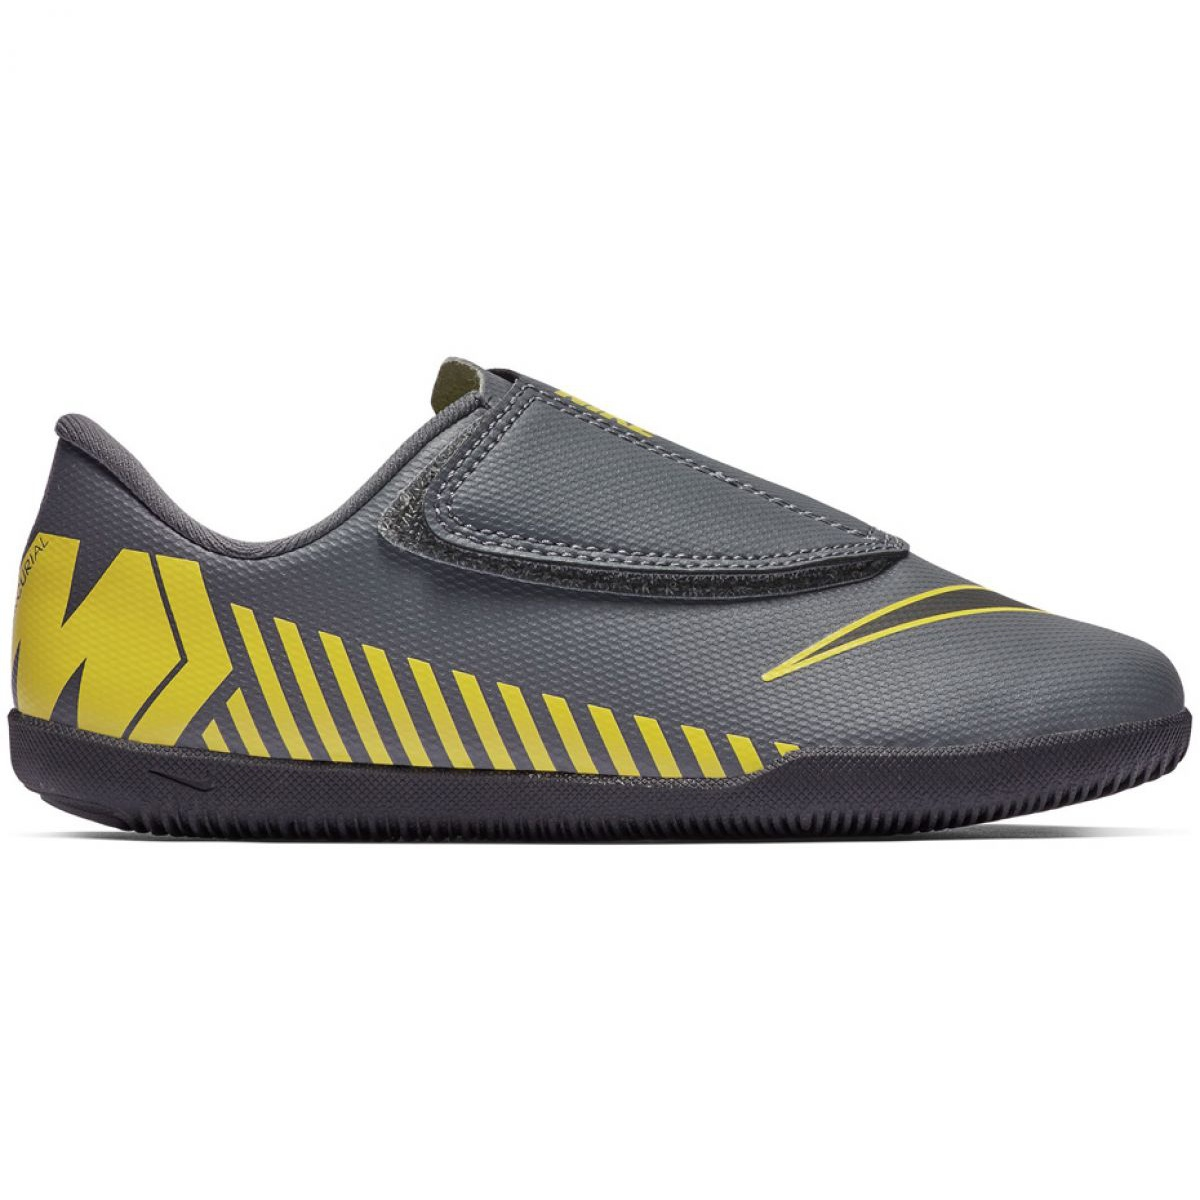 Nike Mercurial Vapor 12 Academy Schuhe Neymar Ic Jr. AO9474